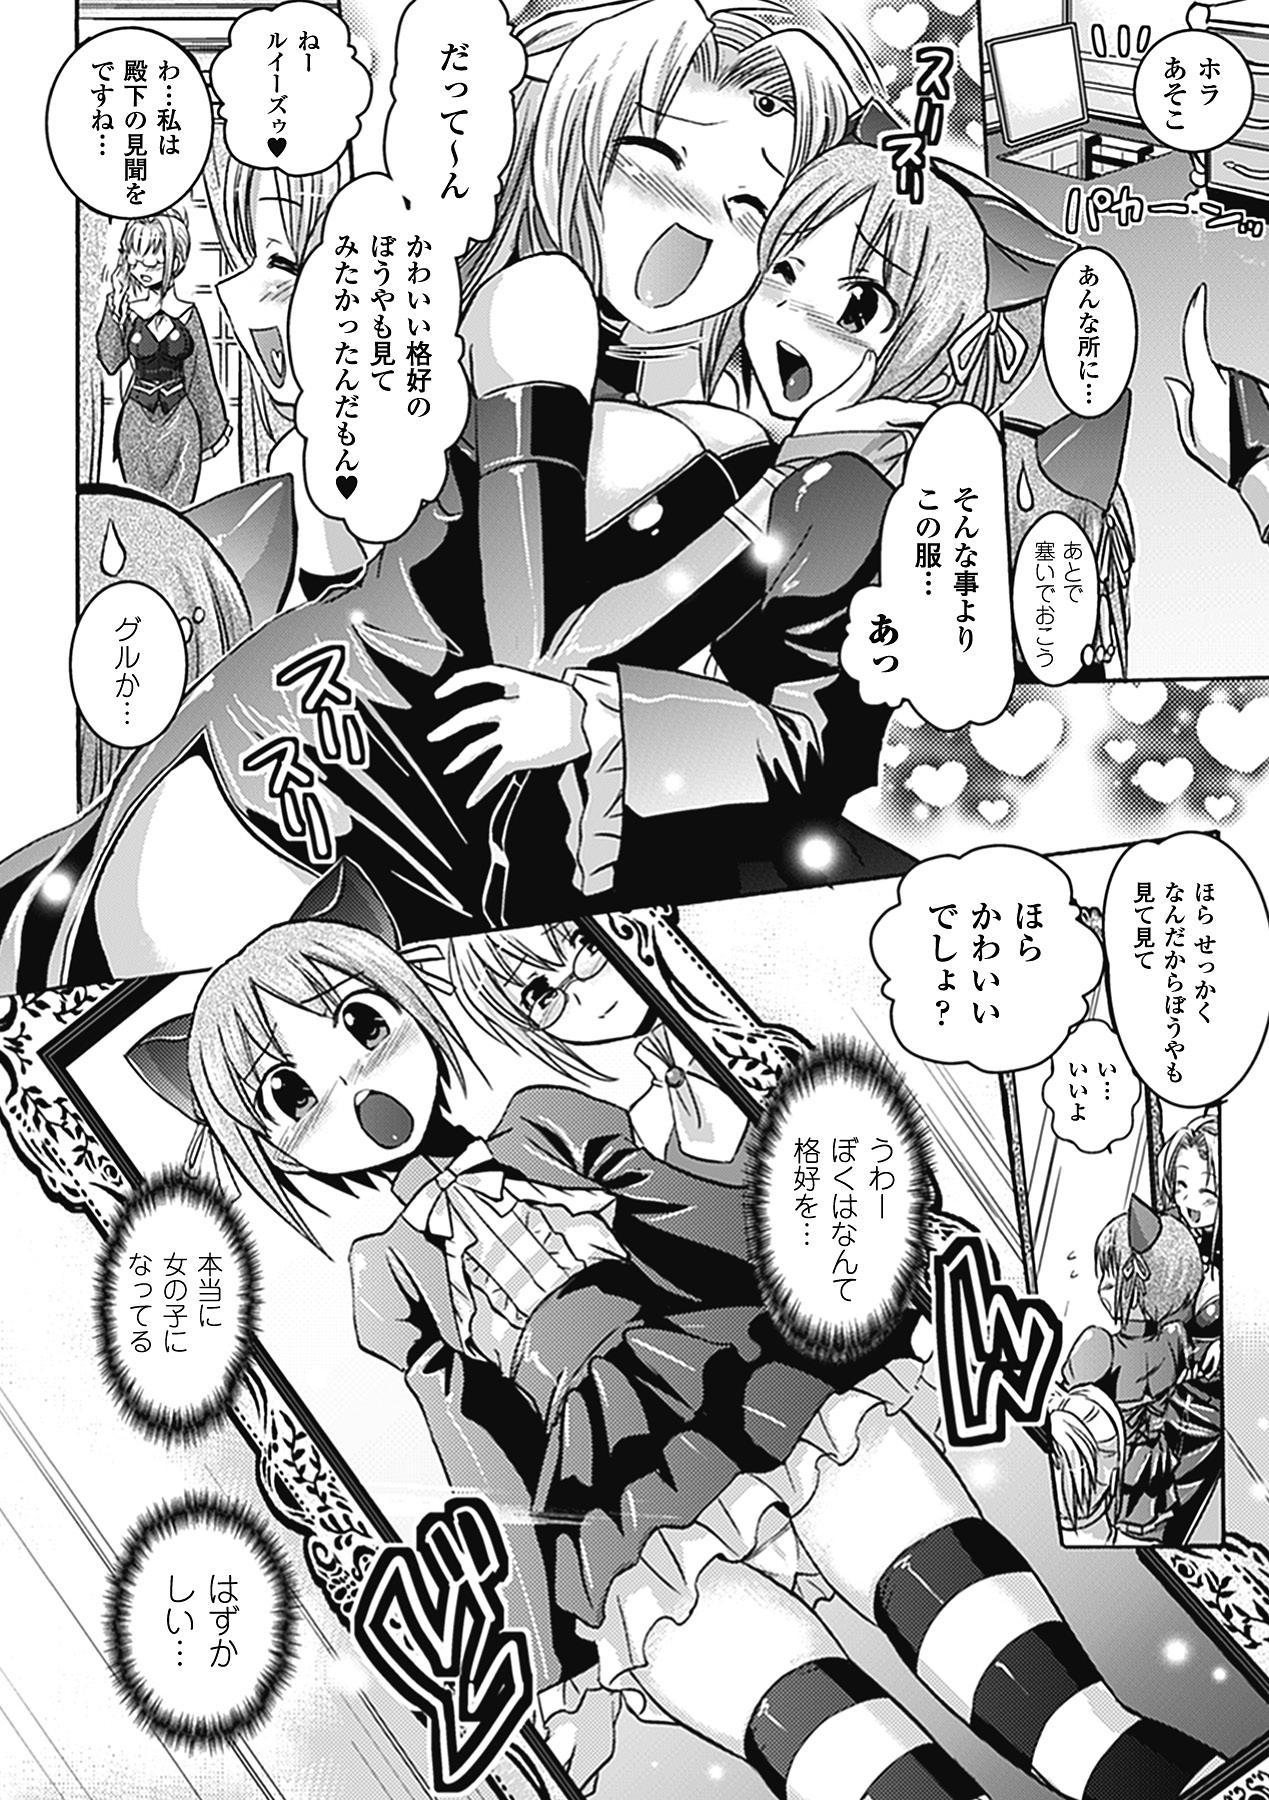 Megami Crisis 1 106